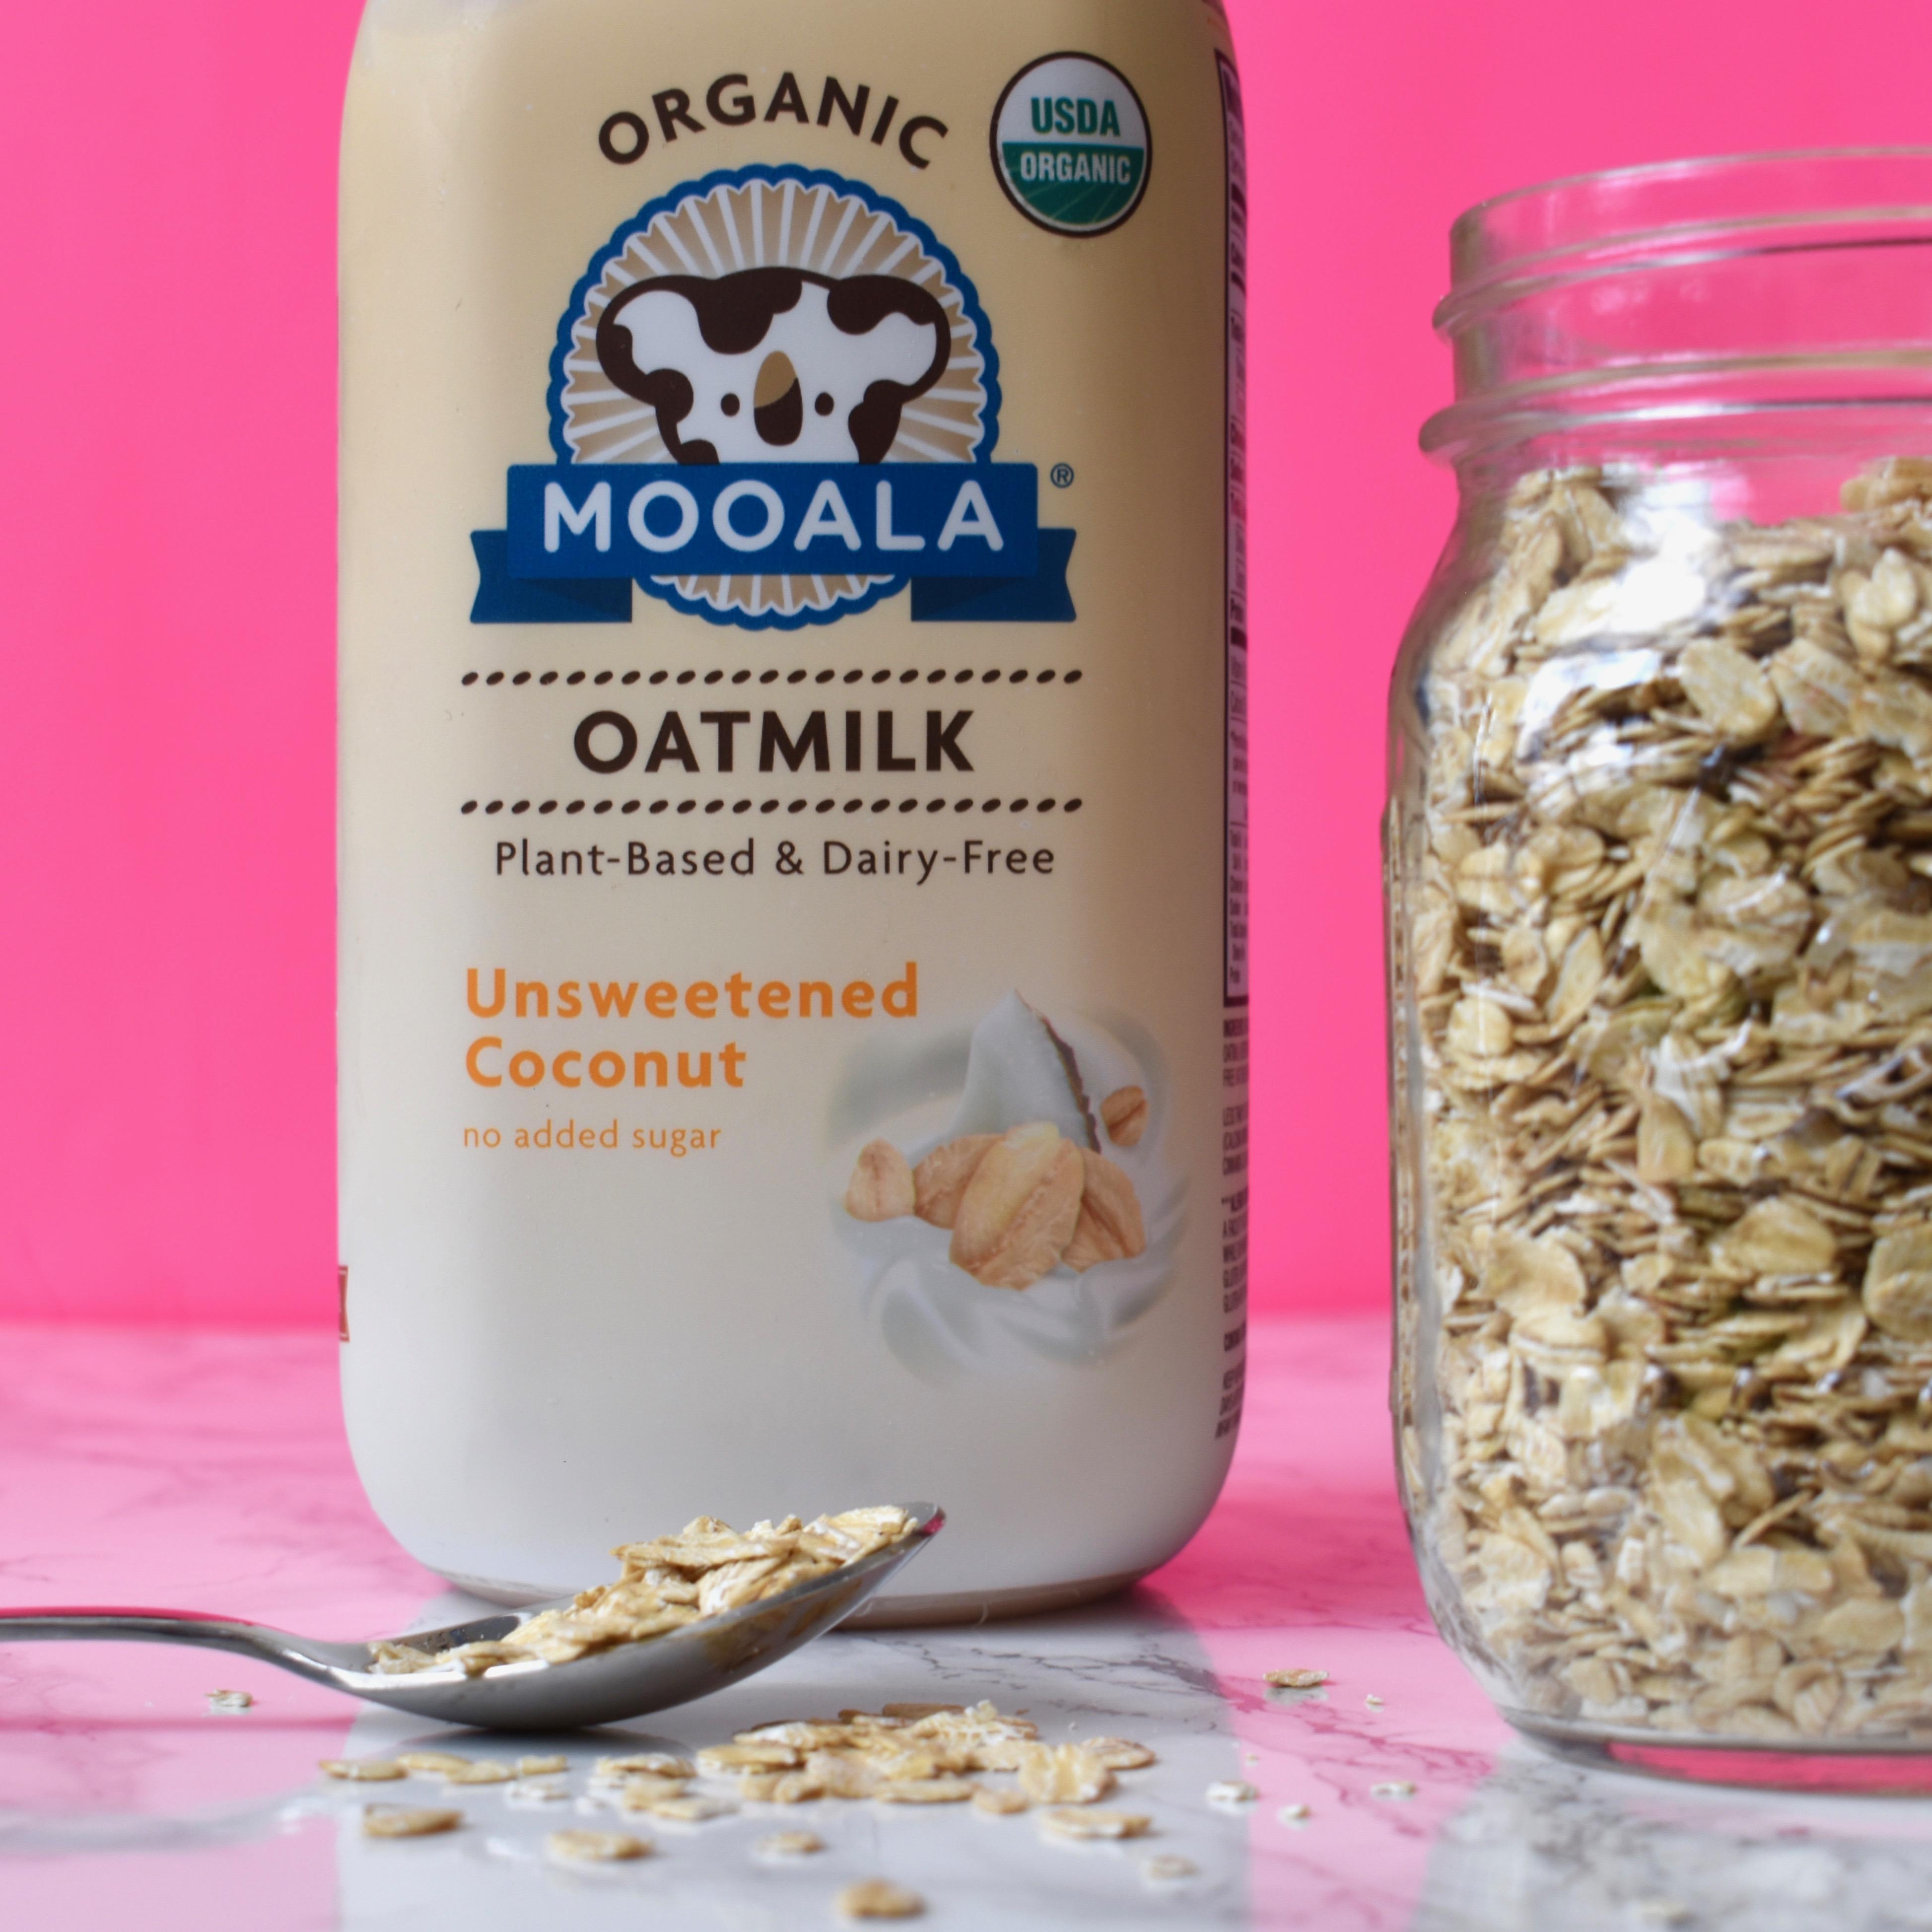 Mooala oat milk